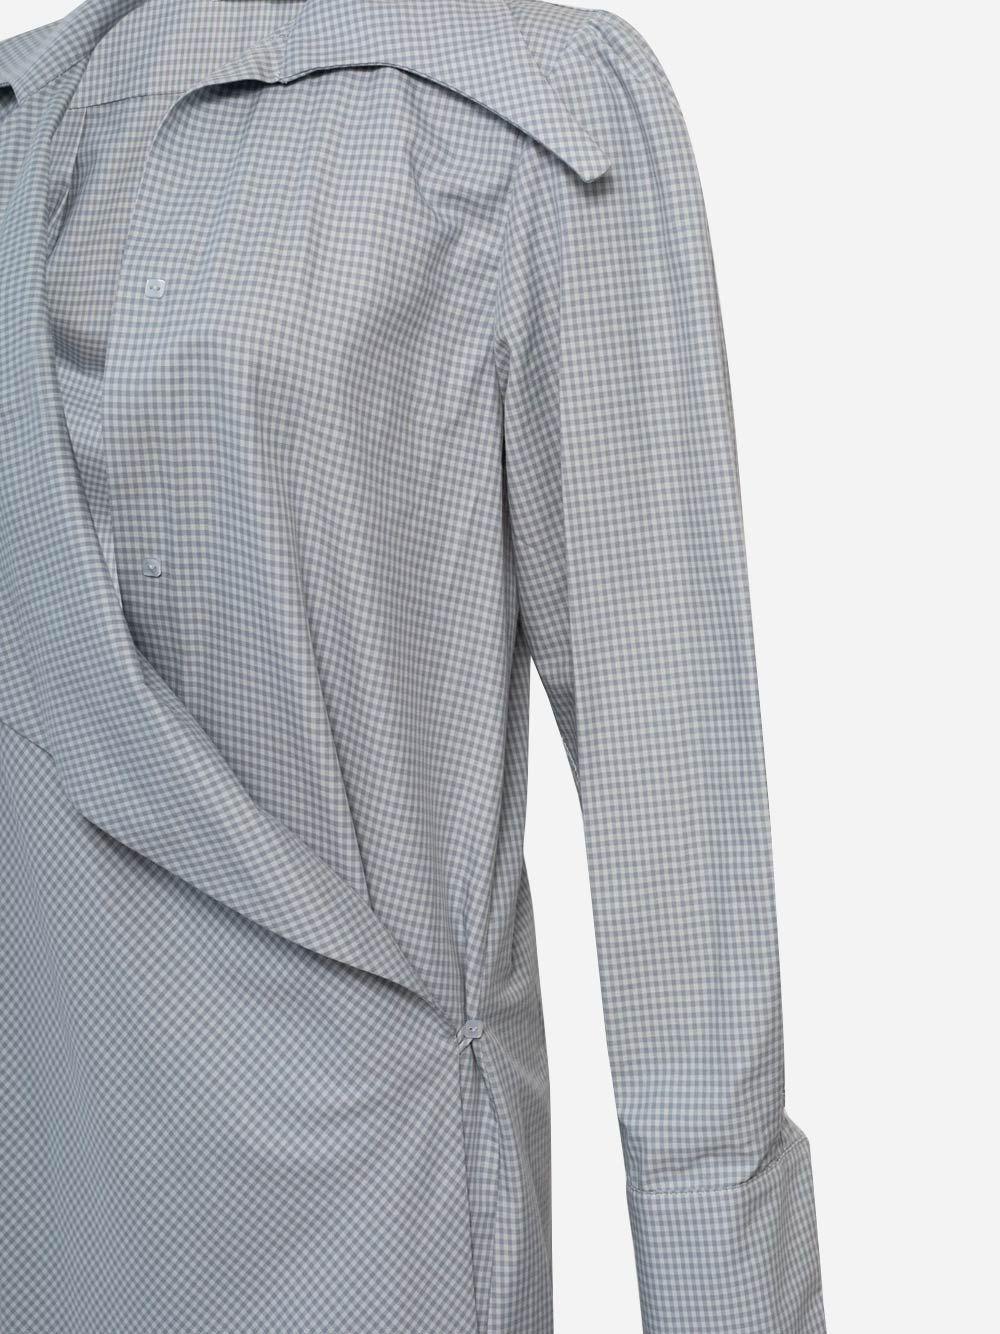 Indigo Draped Plaid Shirt